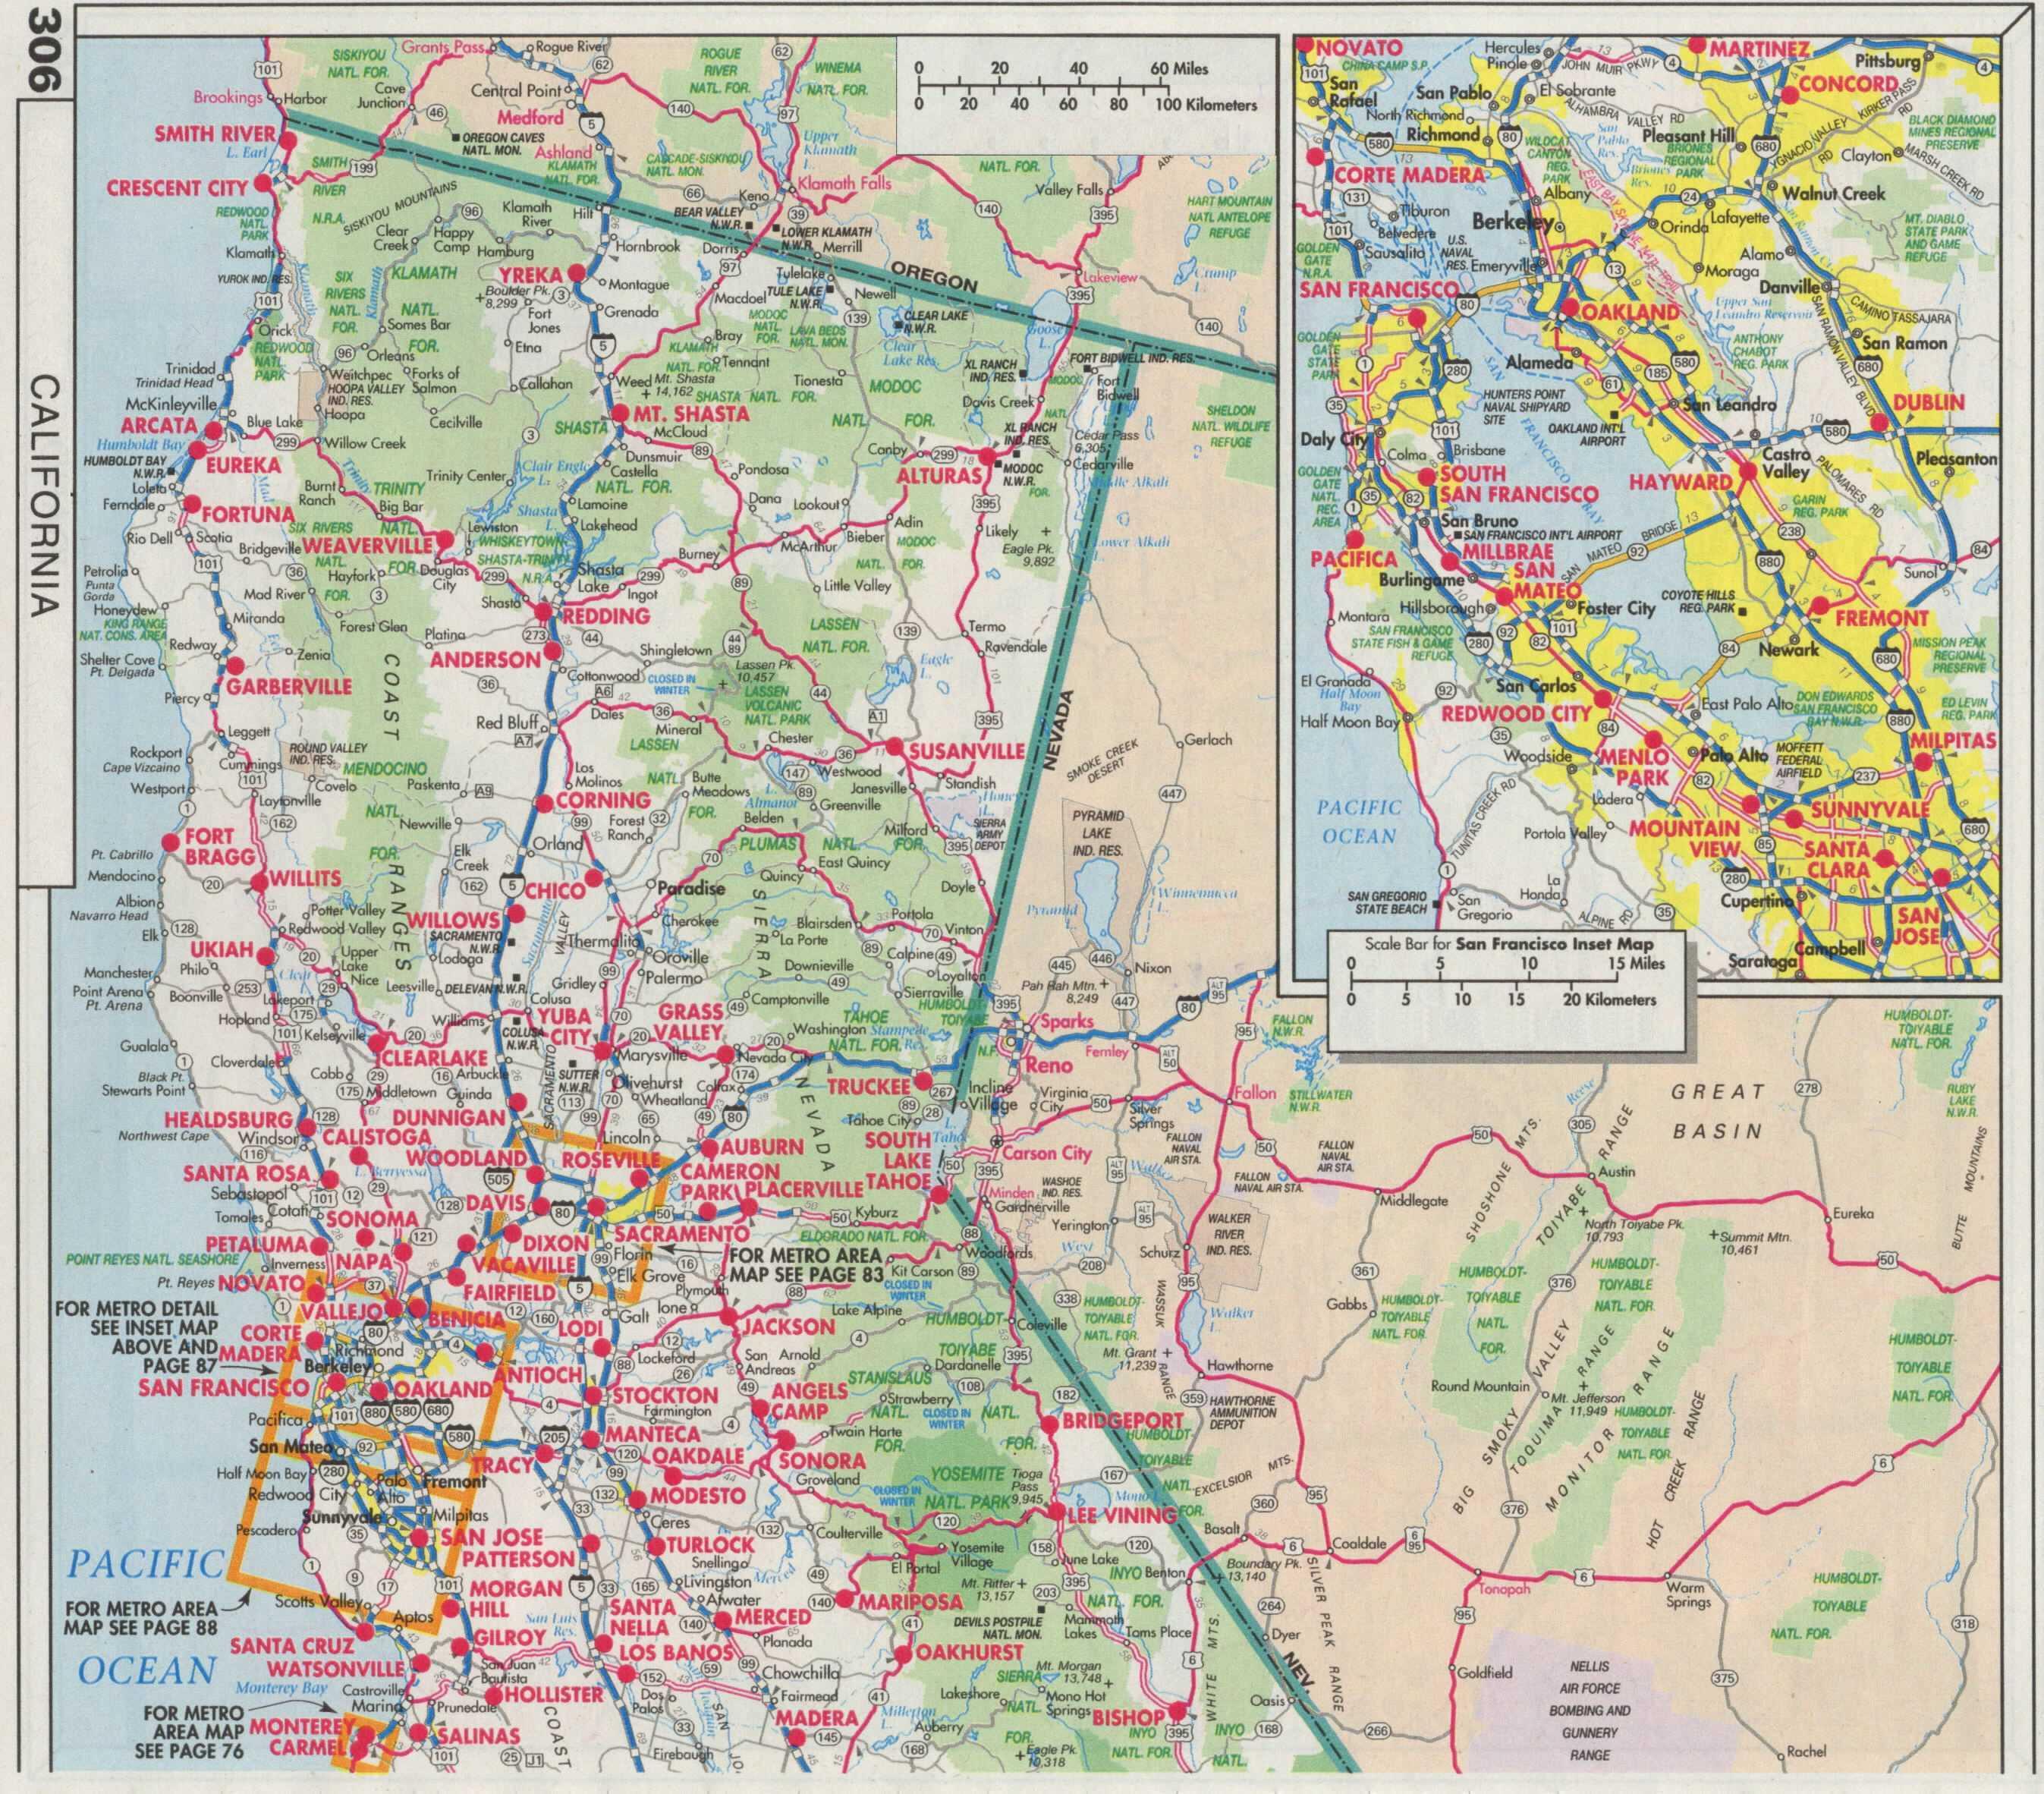 Highway Map Of Northern California - Klipy - Driving Map Of Northern California